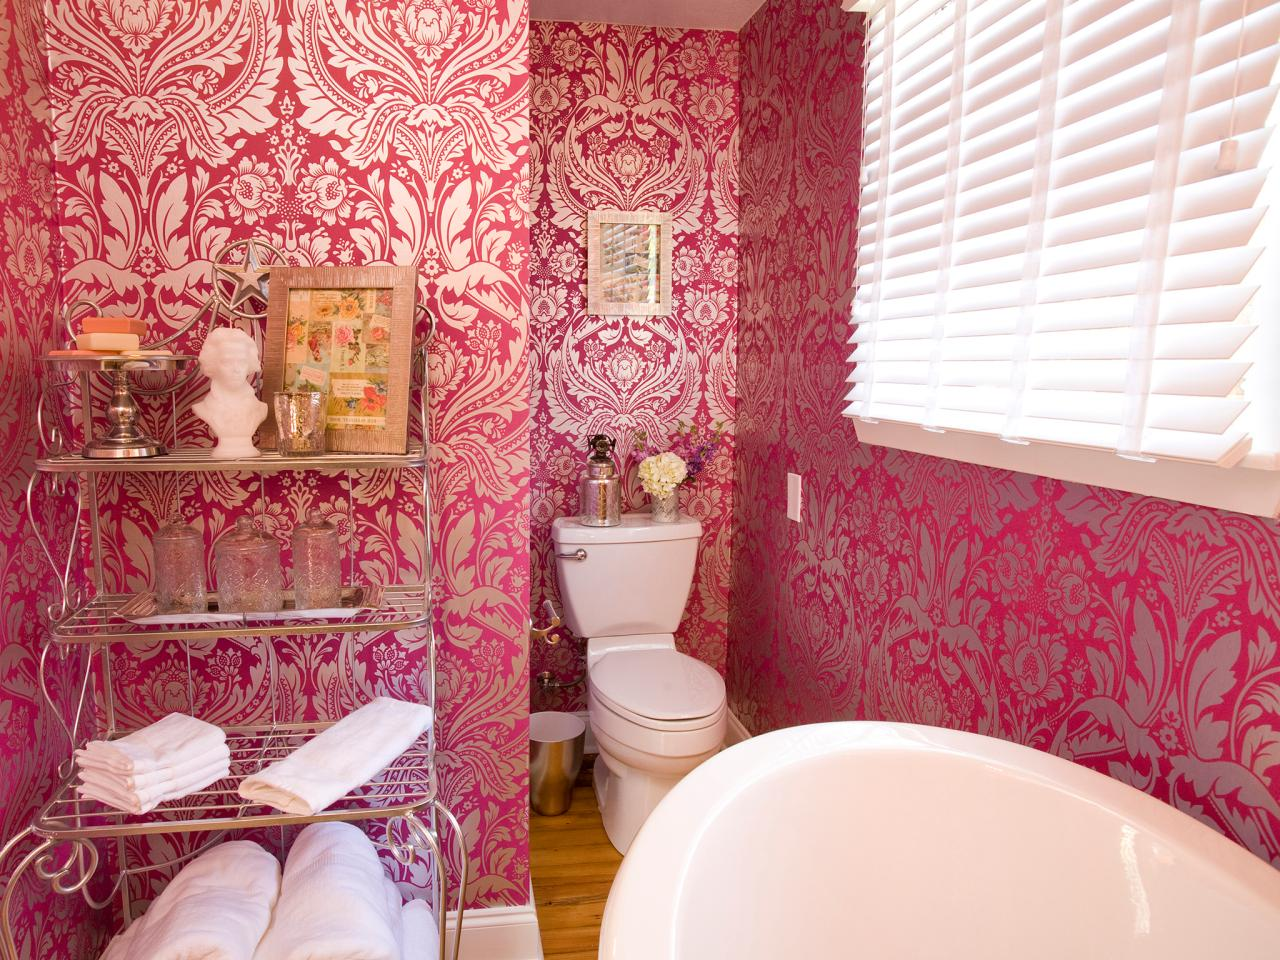 hpbrs408h_pink-wallpaper-bathroom-french_4x3-jpg-rend-hgtvcom-1280-960